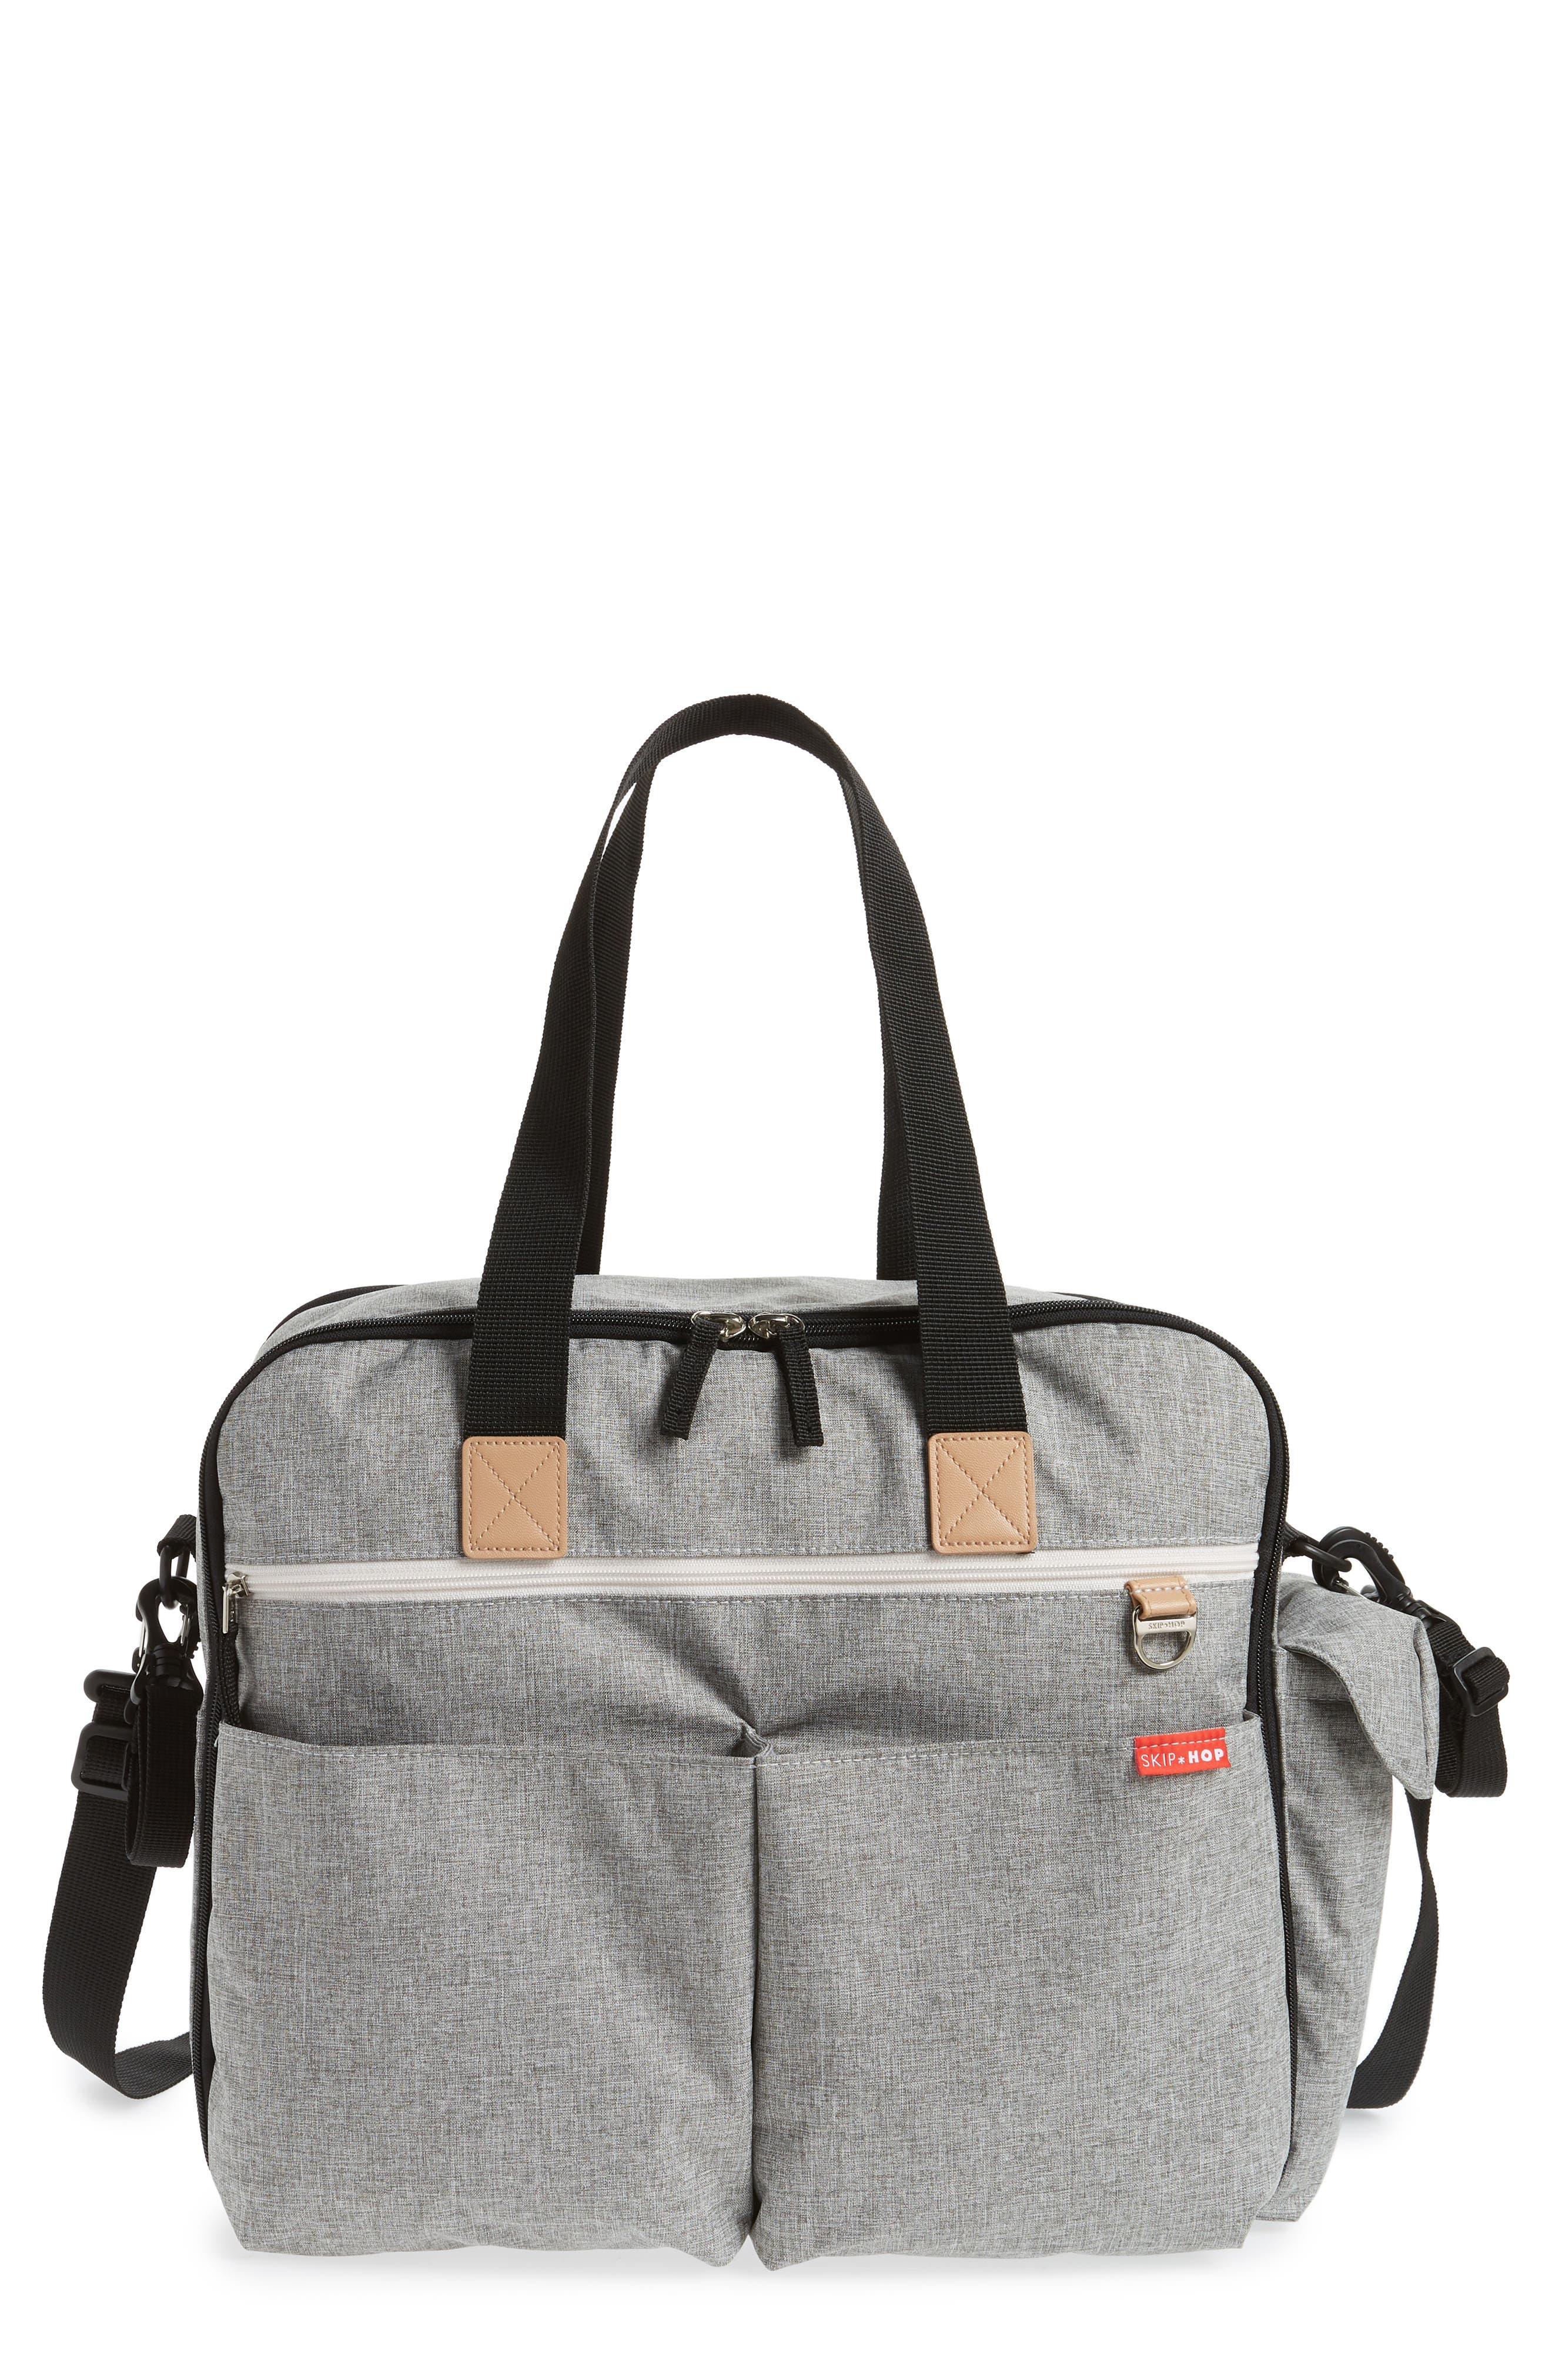 Skip Hop Duo Weekend Diaper Bag